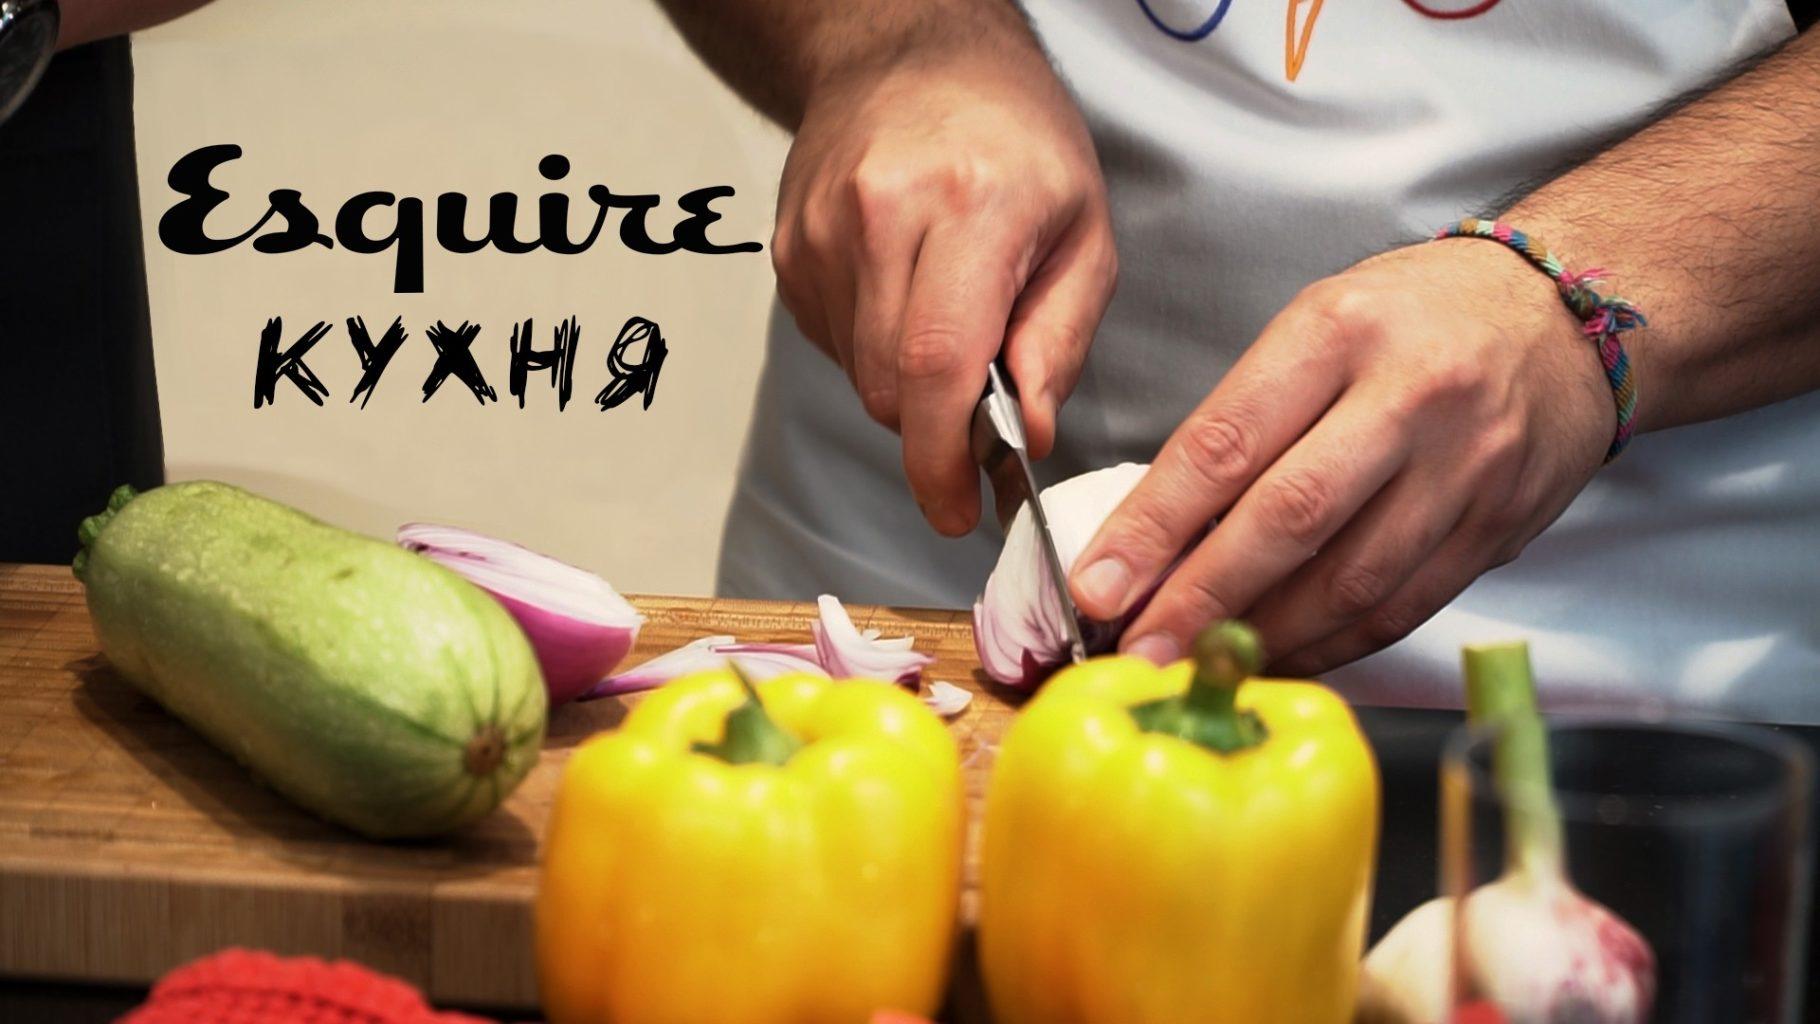 Esquire Кухня:  Ержан Есимханов о выборе профессии, жизни в условиях цейтнота и заплыве через Ла-Манш